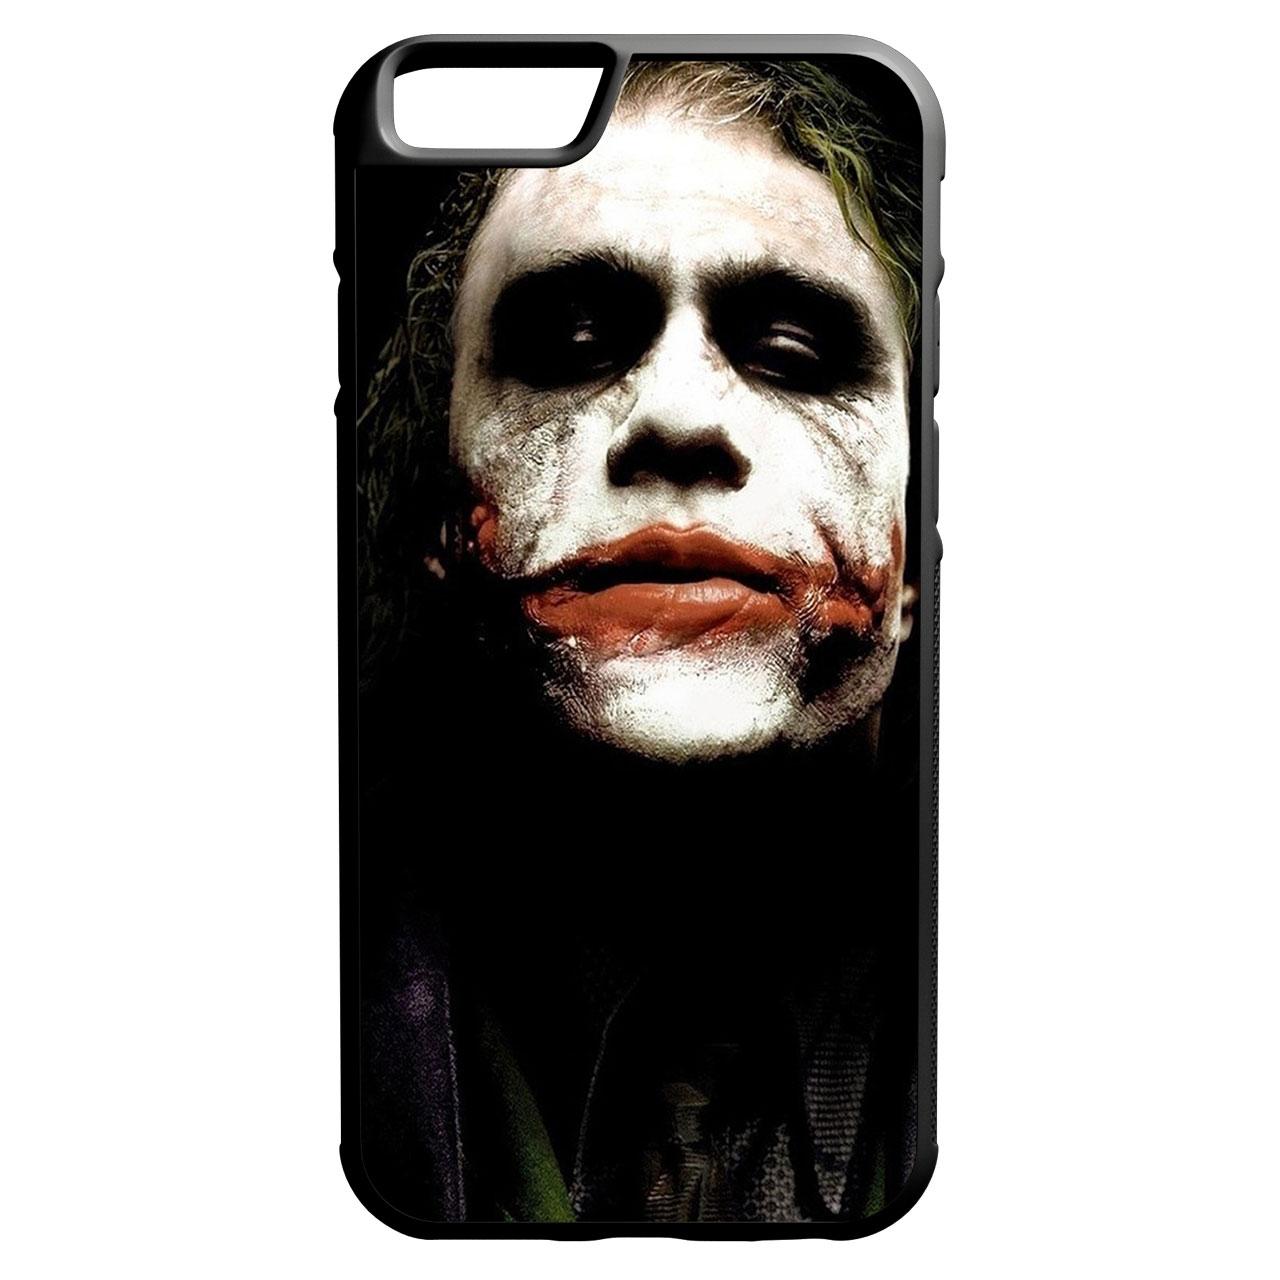 کاور طرح جوکر مدل 0342 مناسب برای گوشی موبایل اپل iphone 6/6s